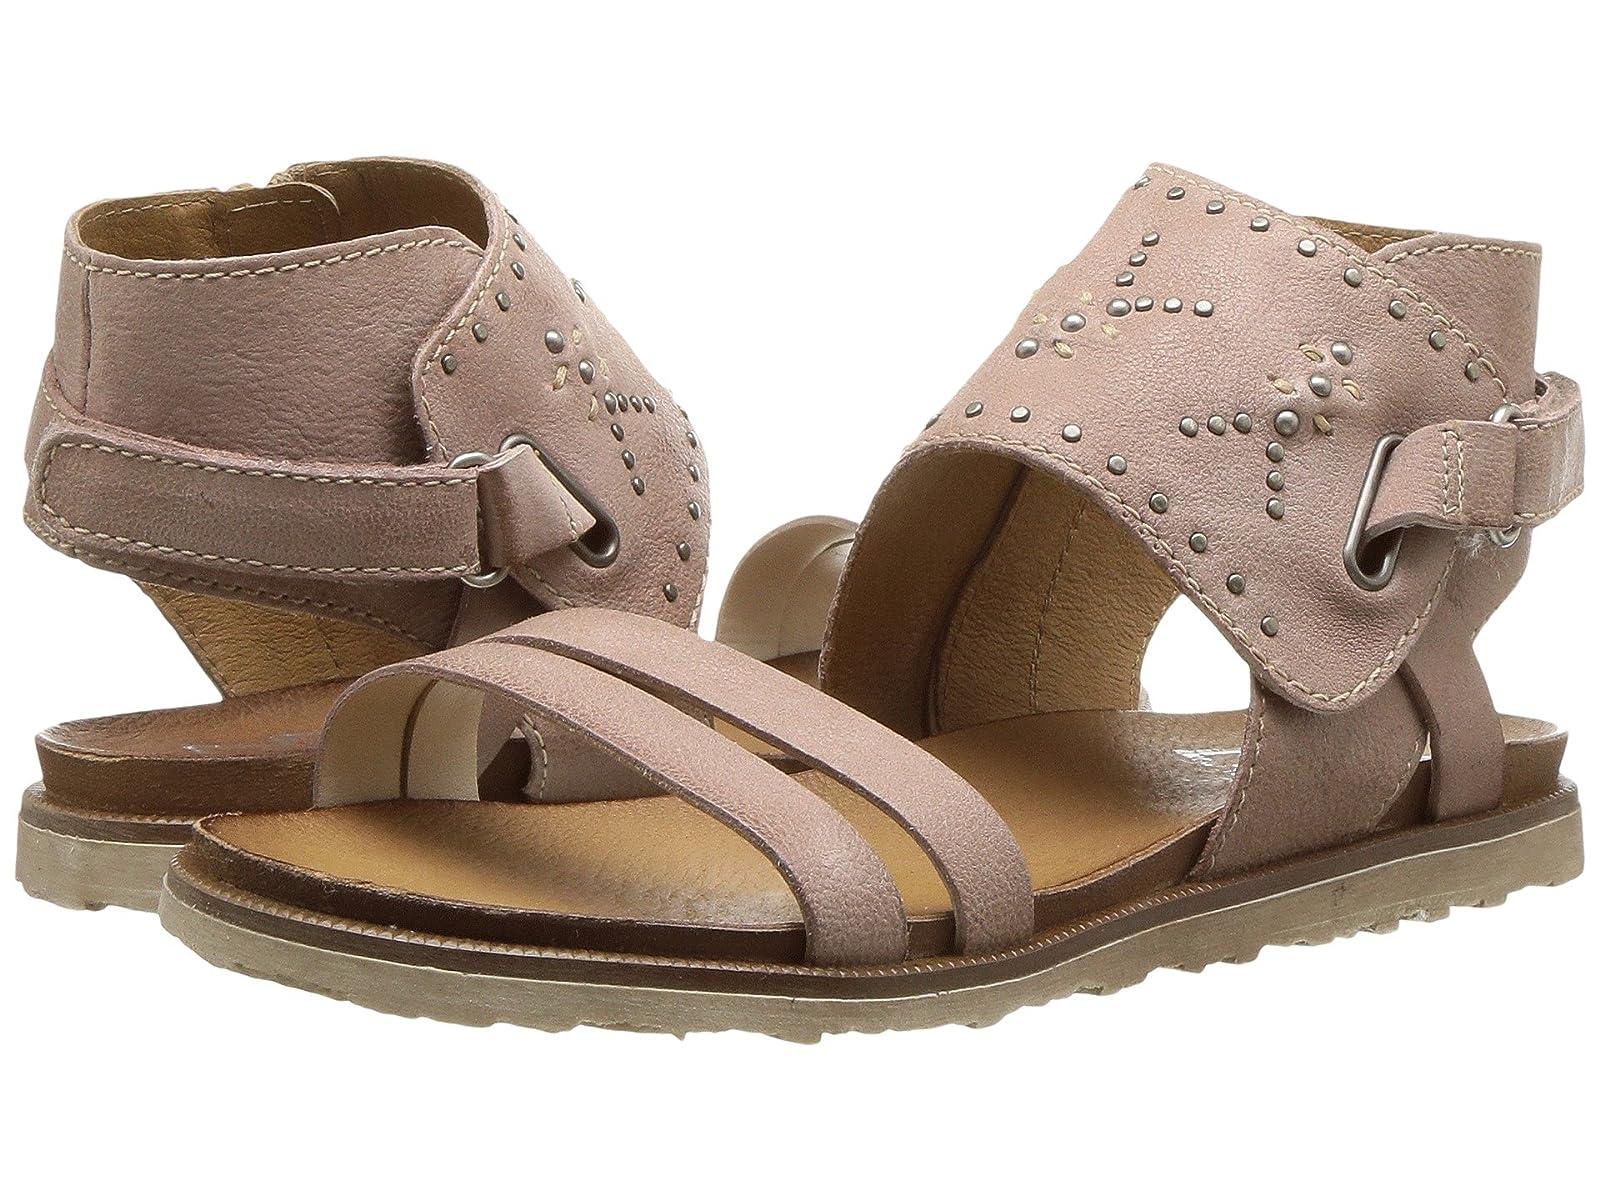 Miz Mooz TibbyAtmospheric grades have affordable shoes